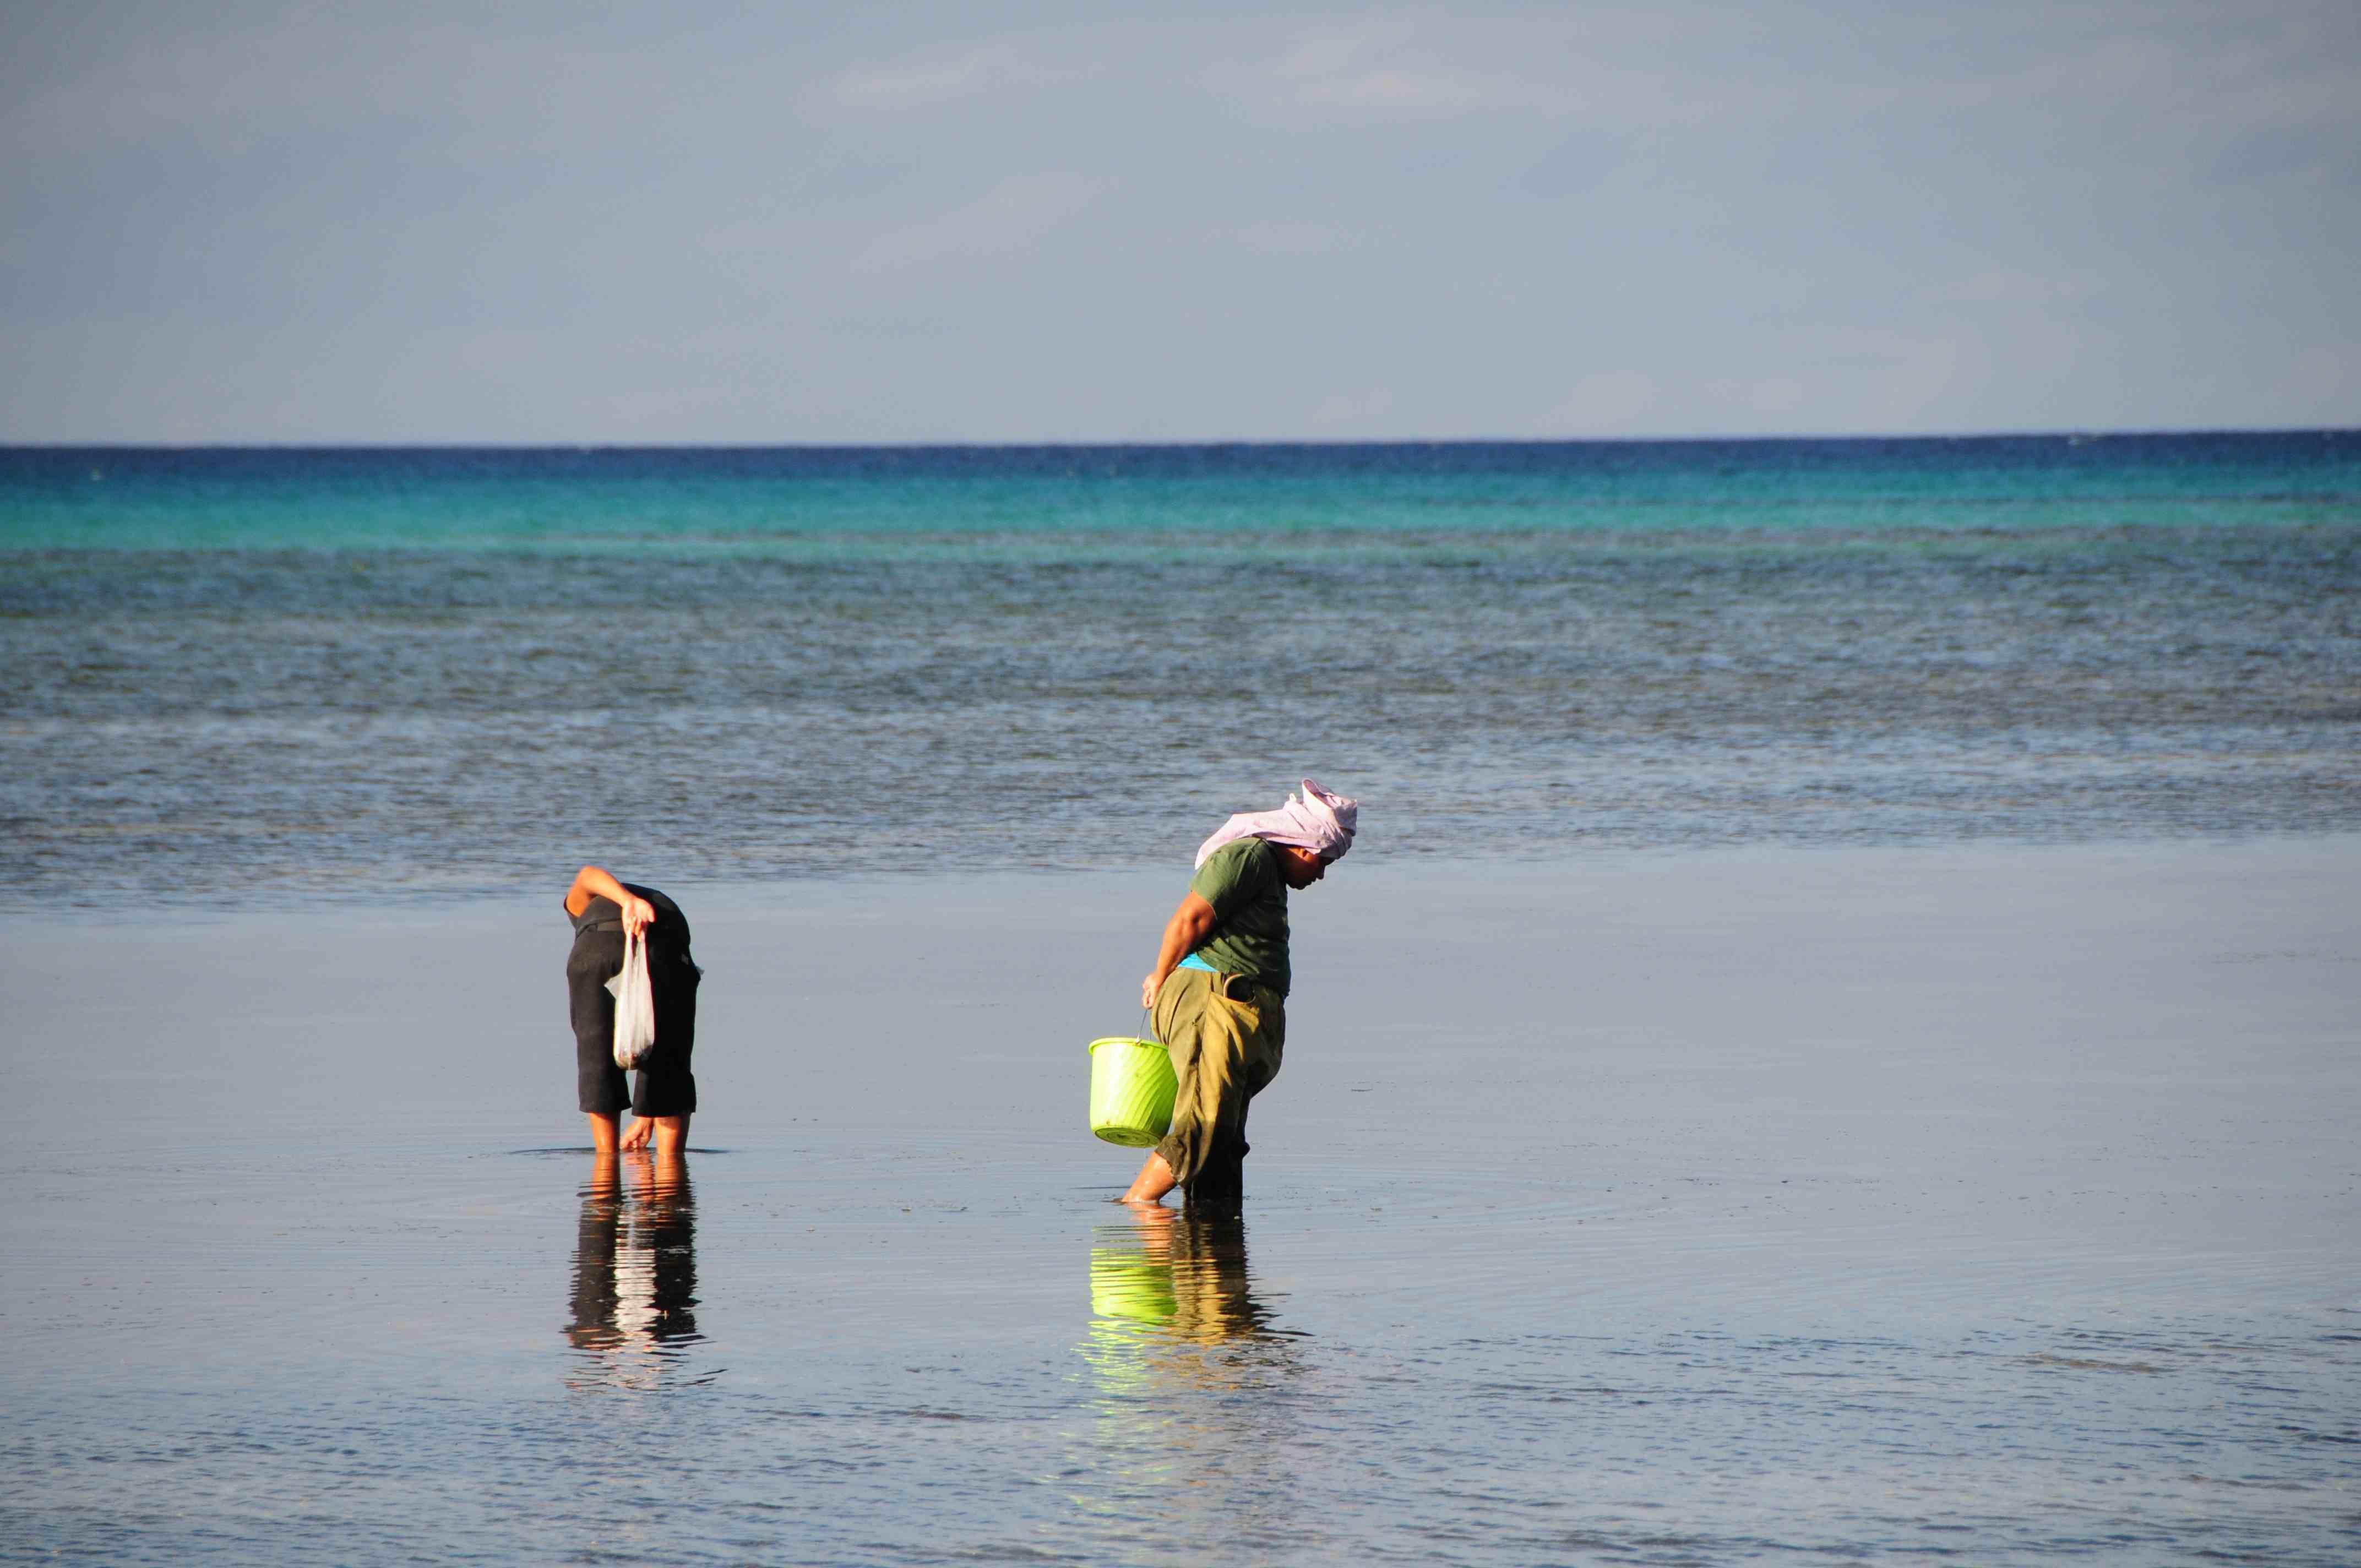 Solomon islands for Solomons island fishing report